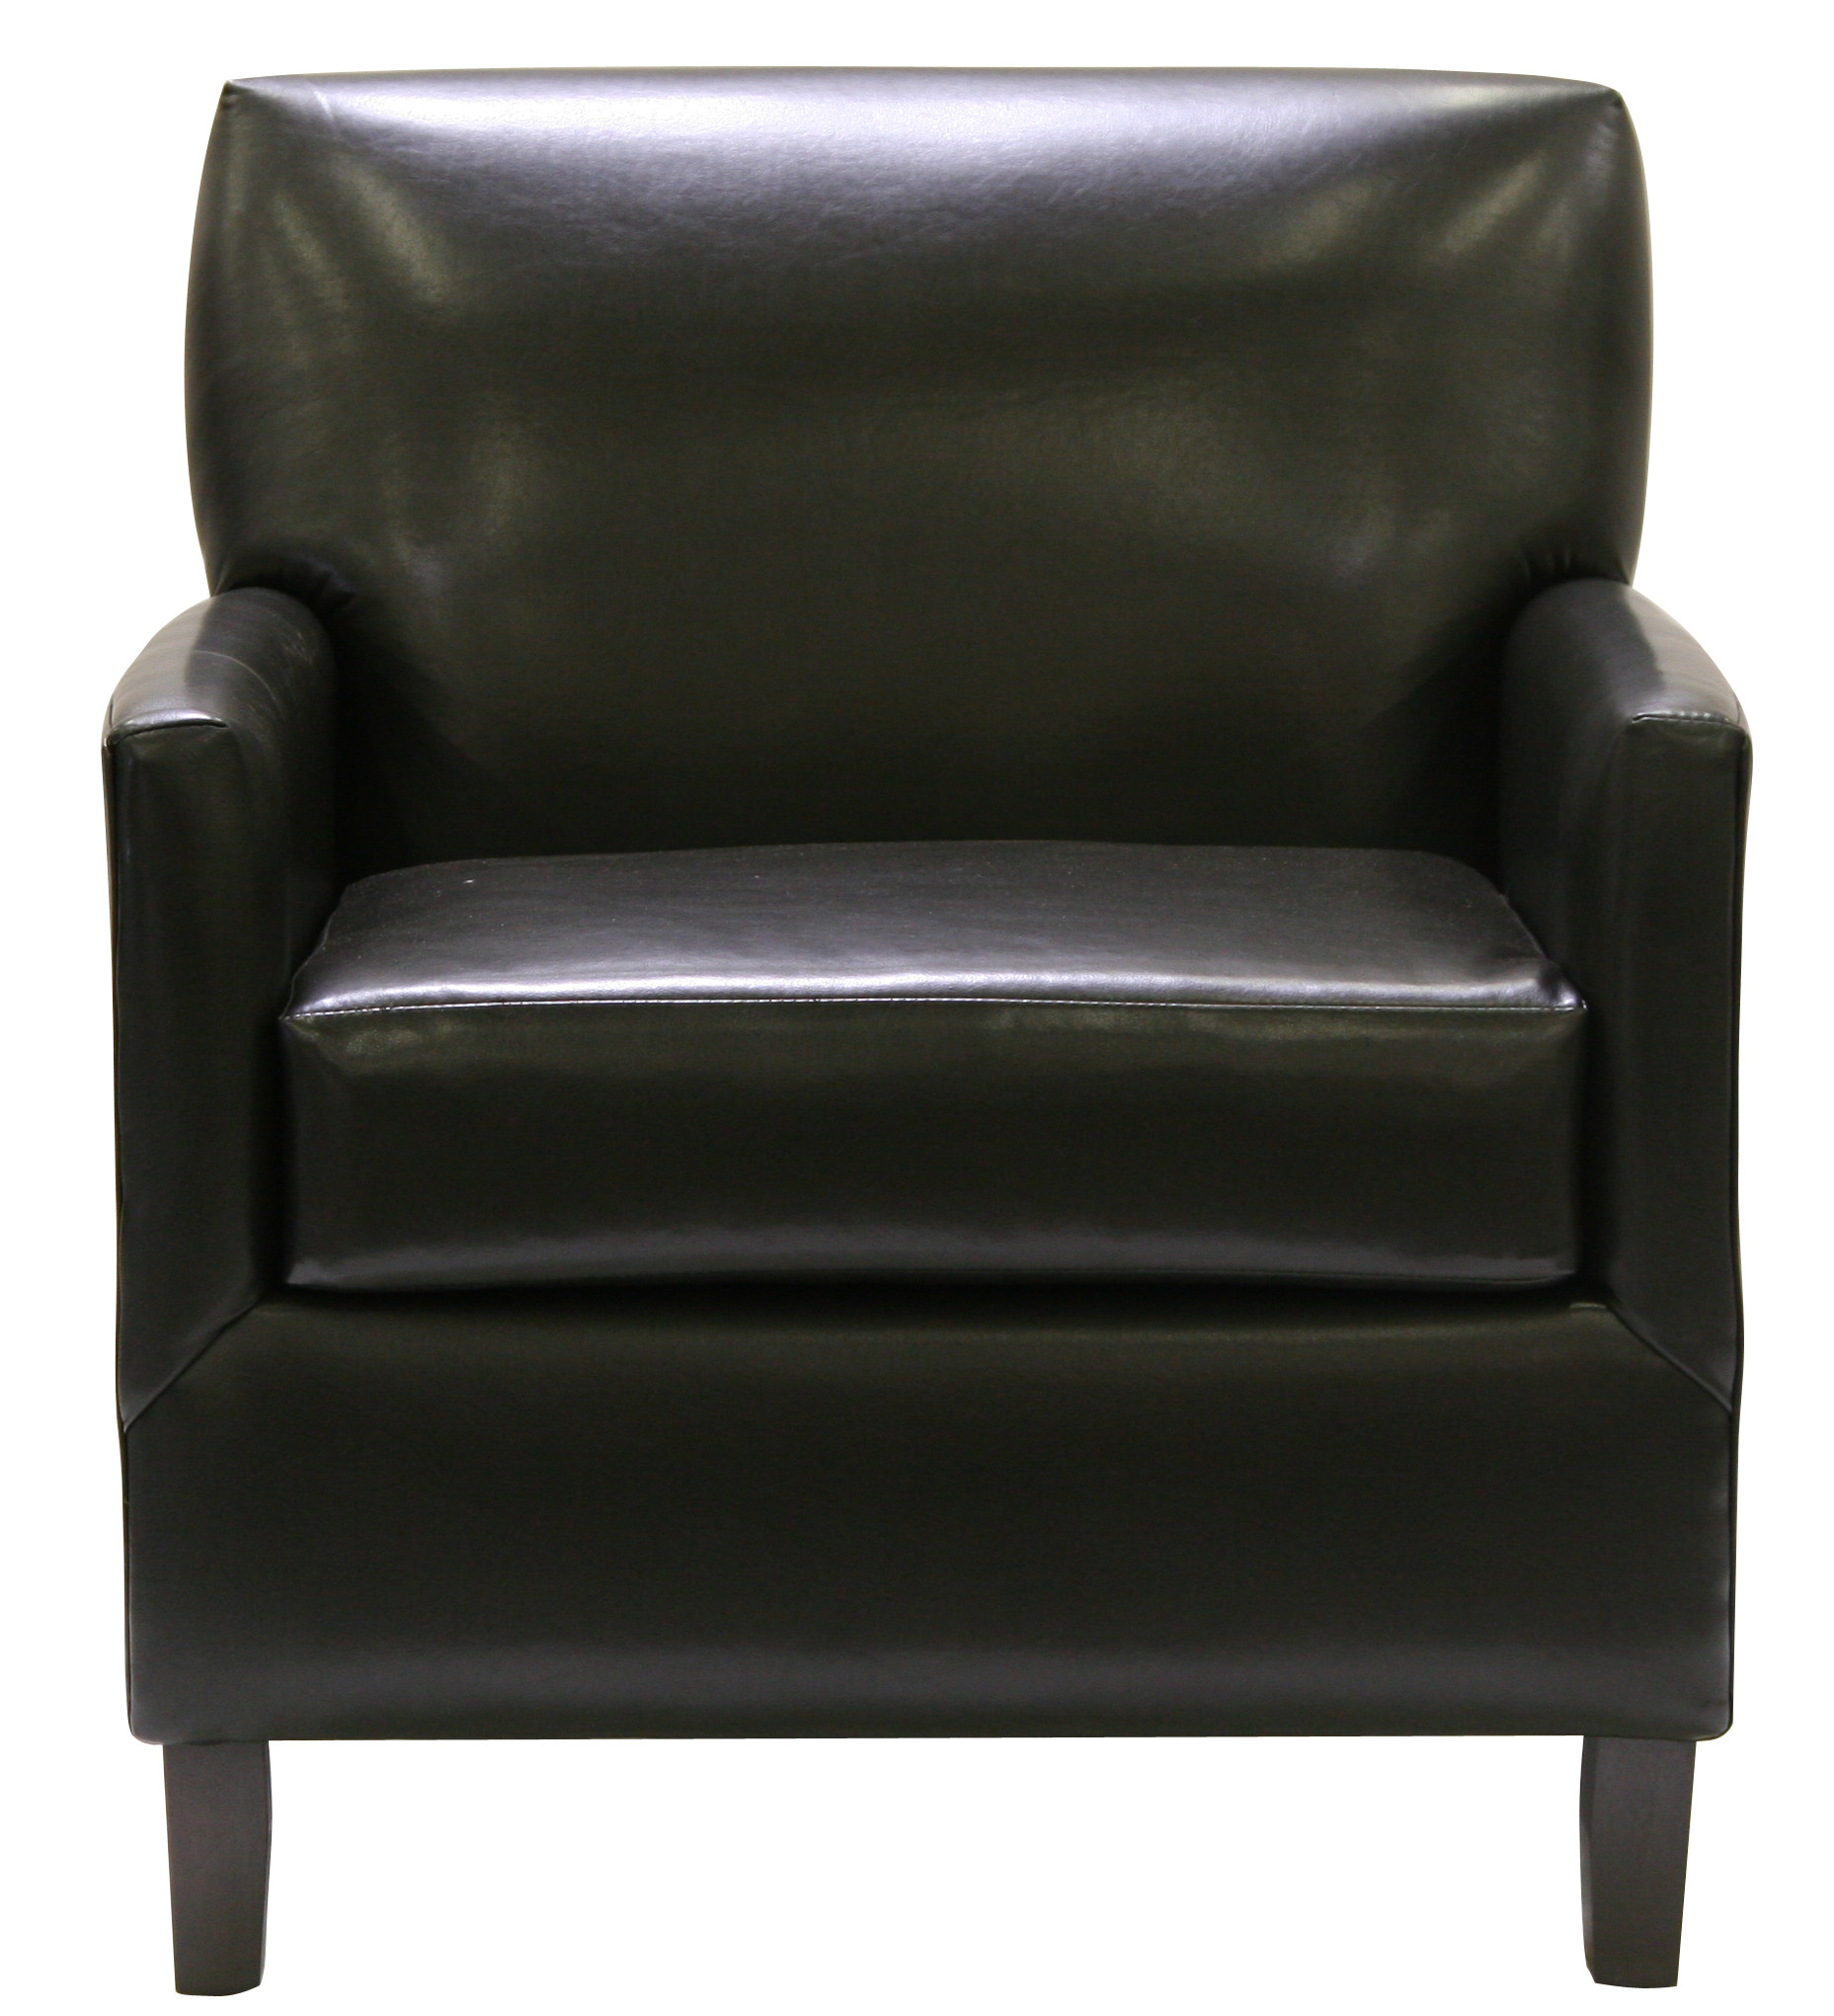 Executive club chair black leather designer8